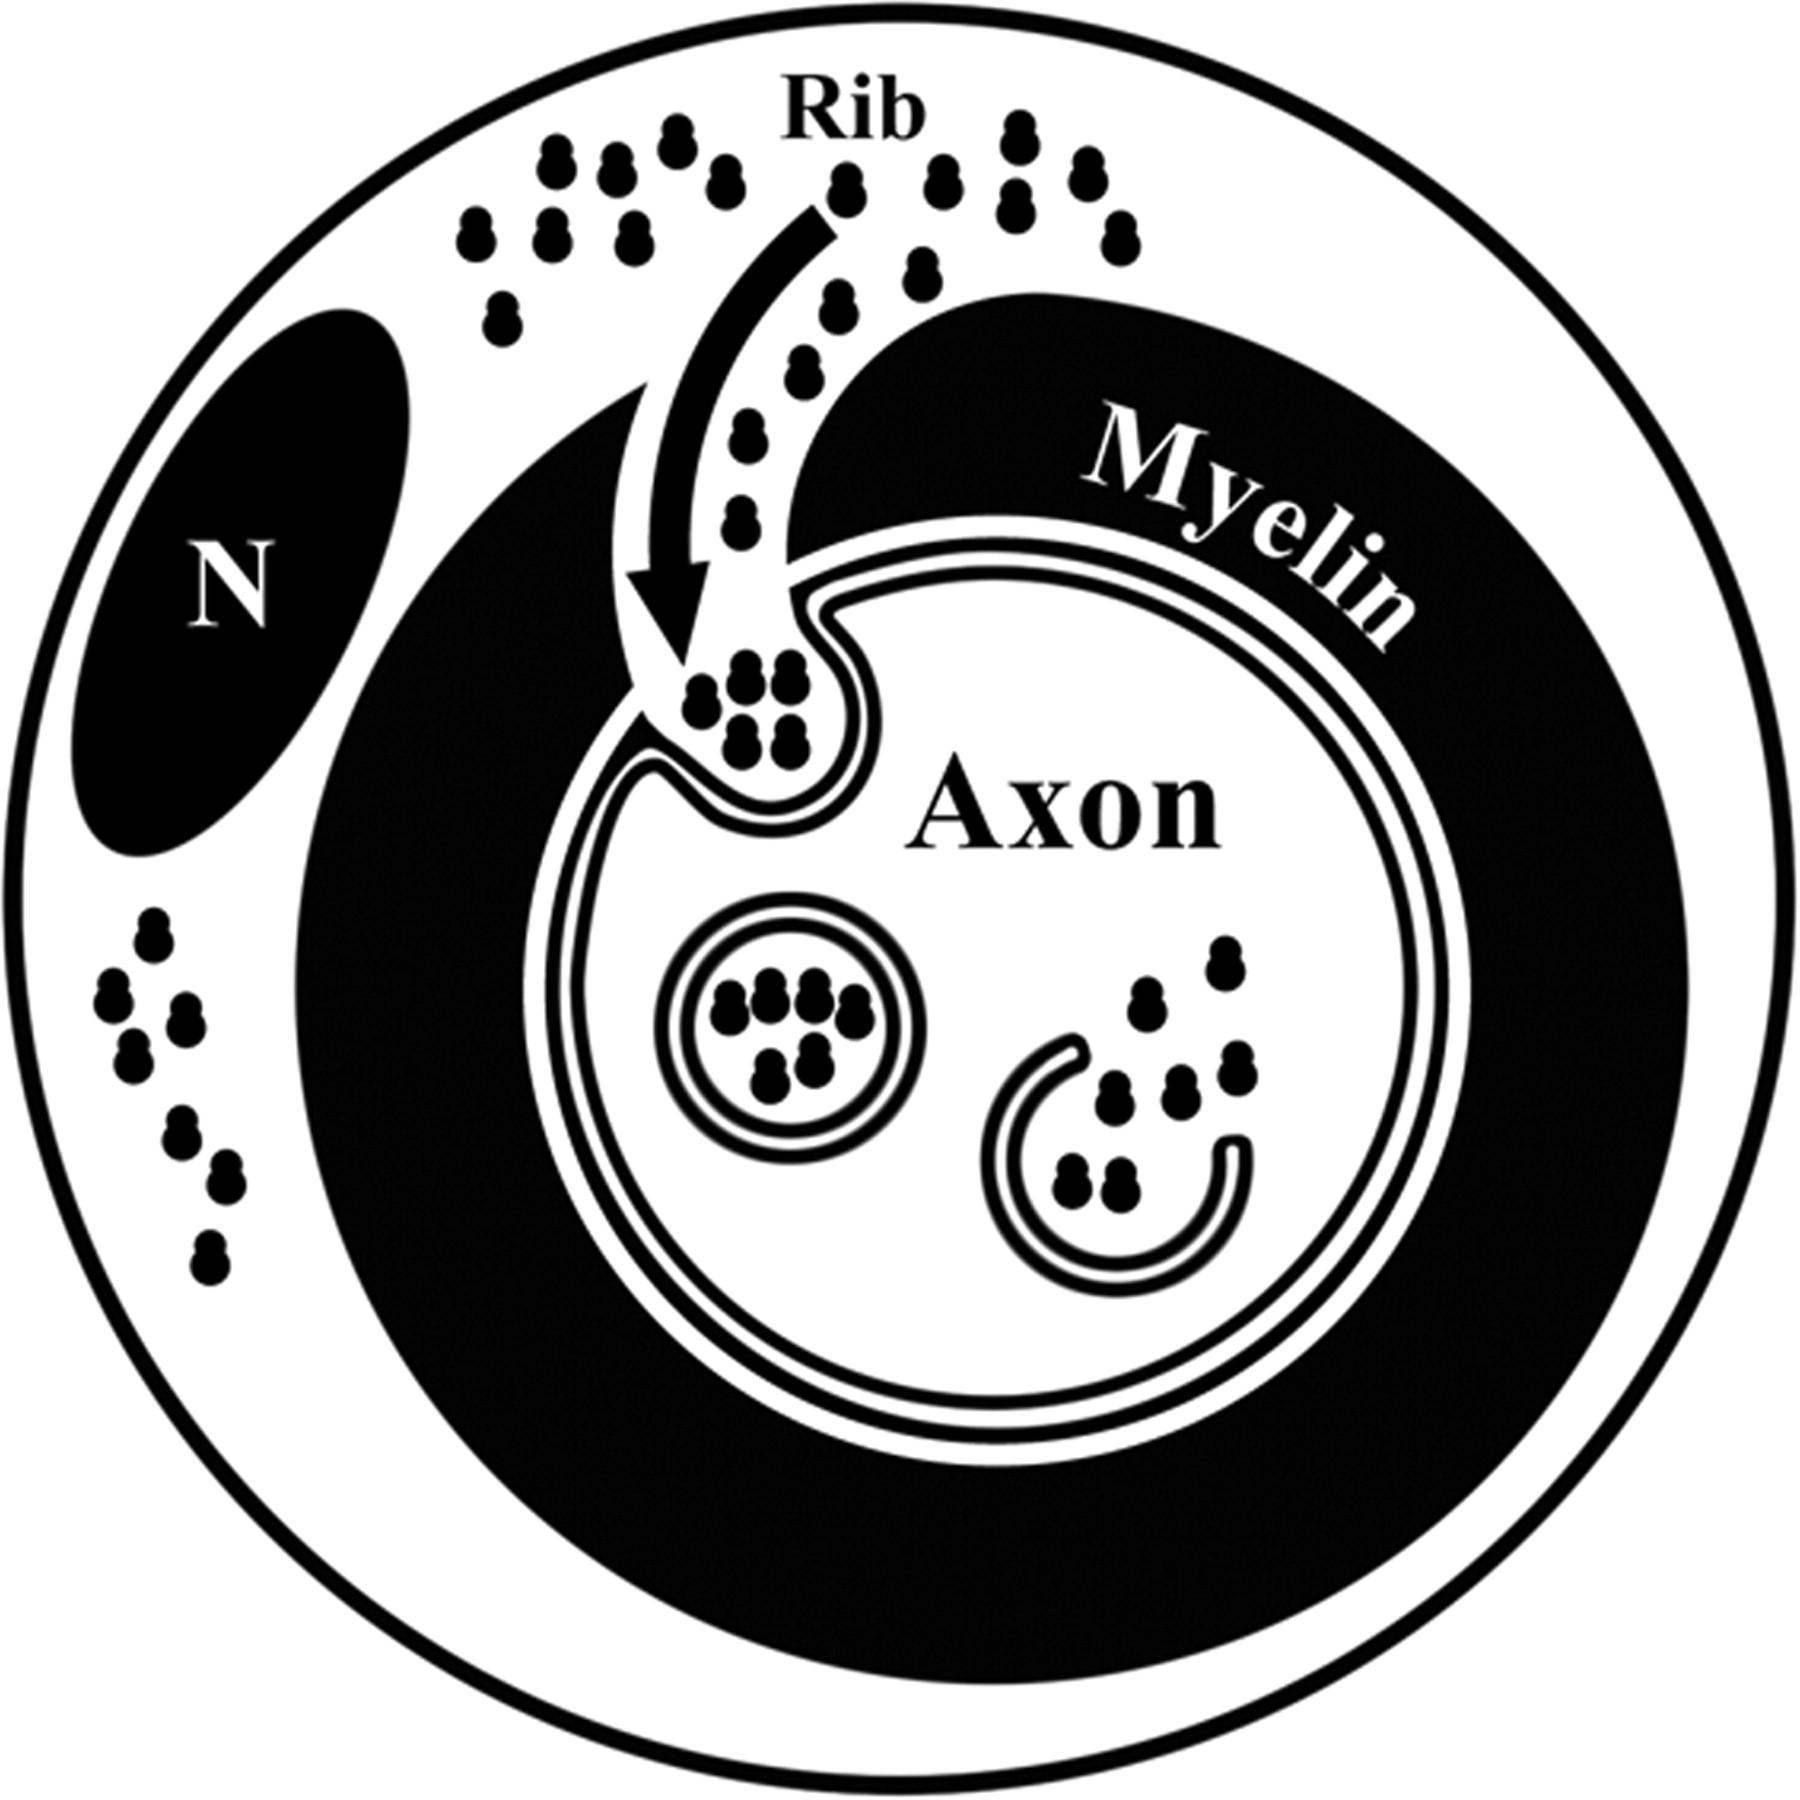 1800x1800 Schwann Cell To Axon Transfer Of Ribosomes Toward A Novel